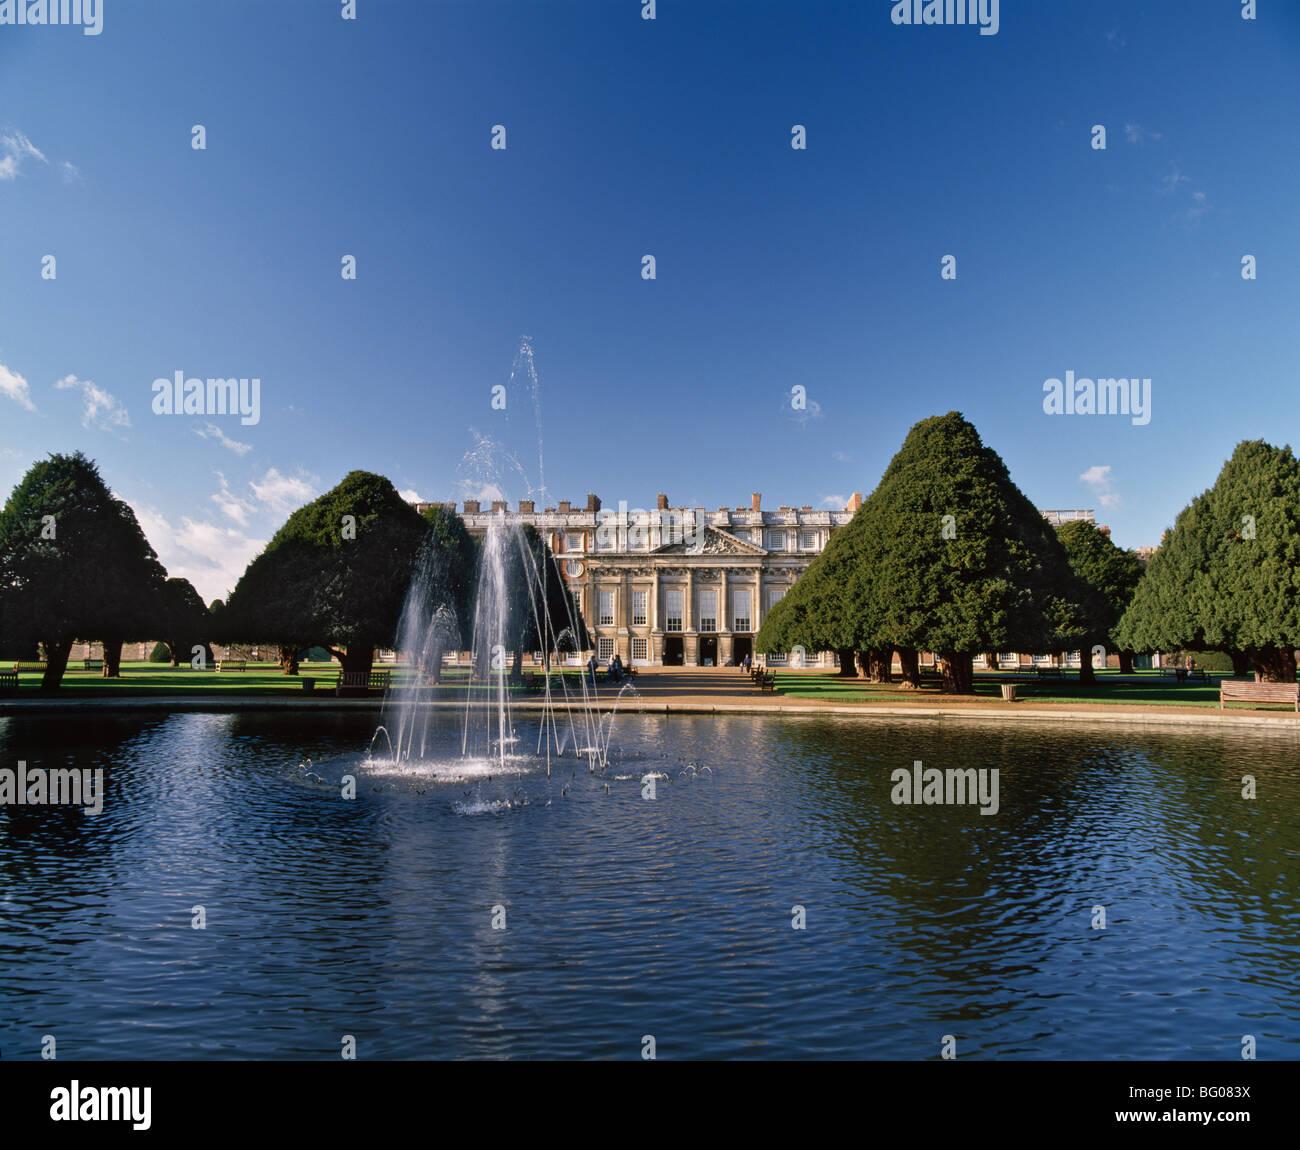 Lake, fountain and ornamental trees in Hampton Court Palace grounds, near London, England, United Kingdom, Europe Stock Photo